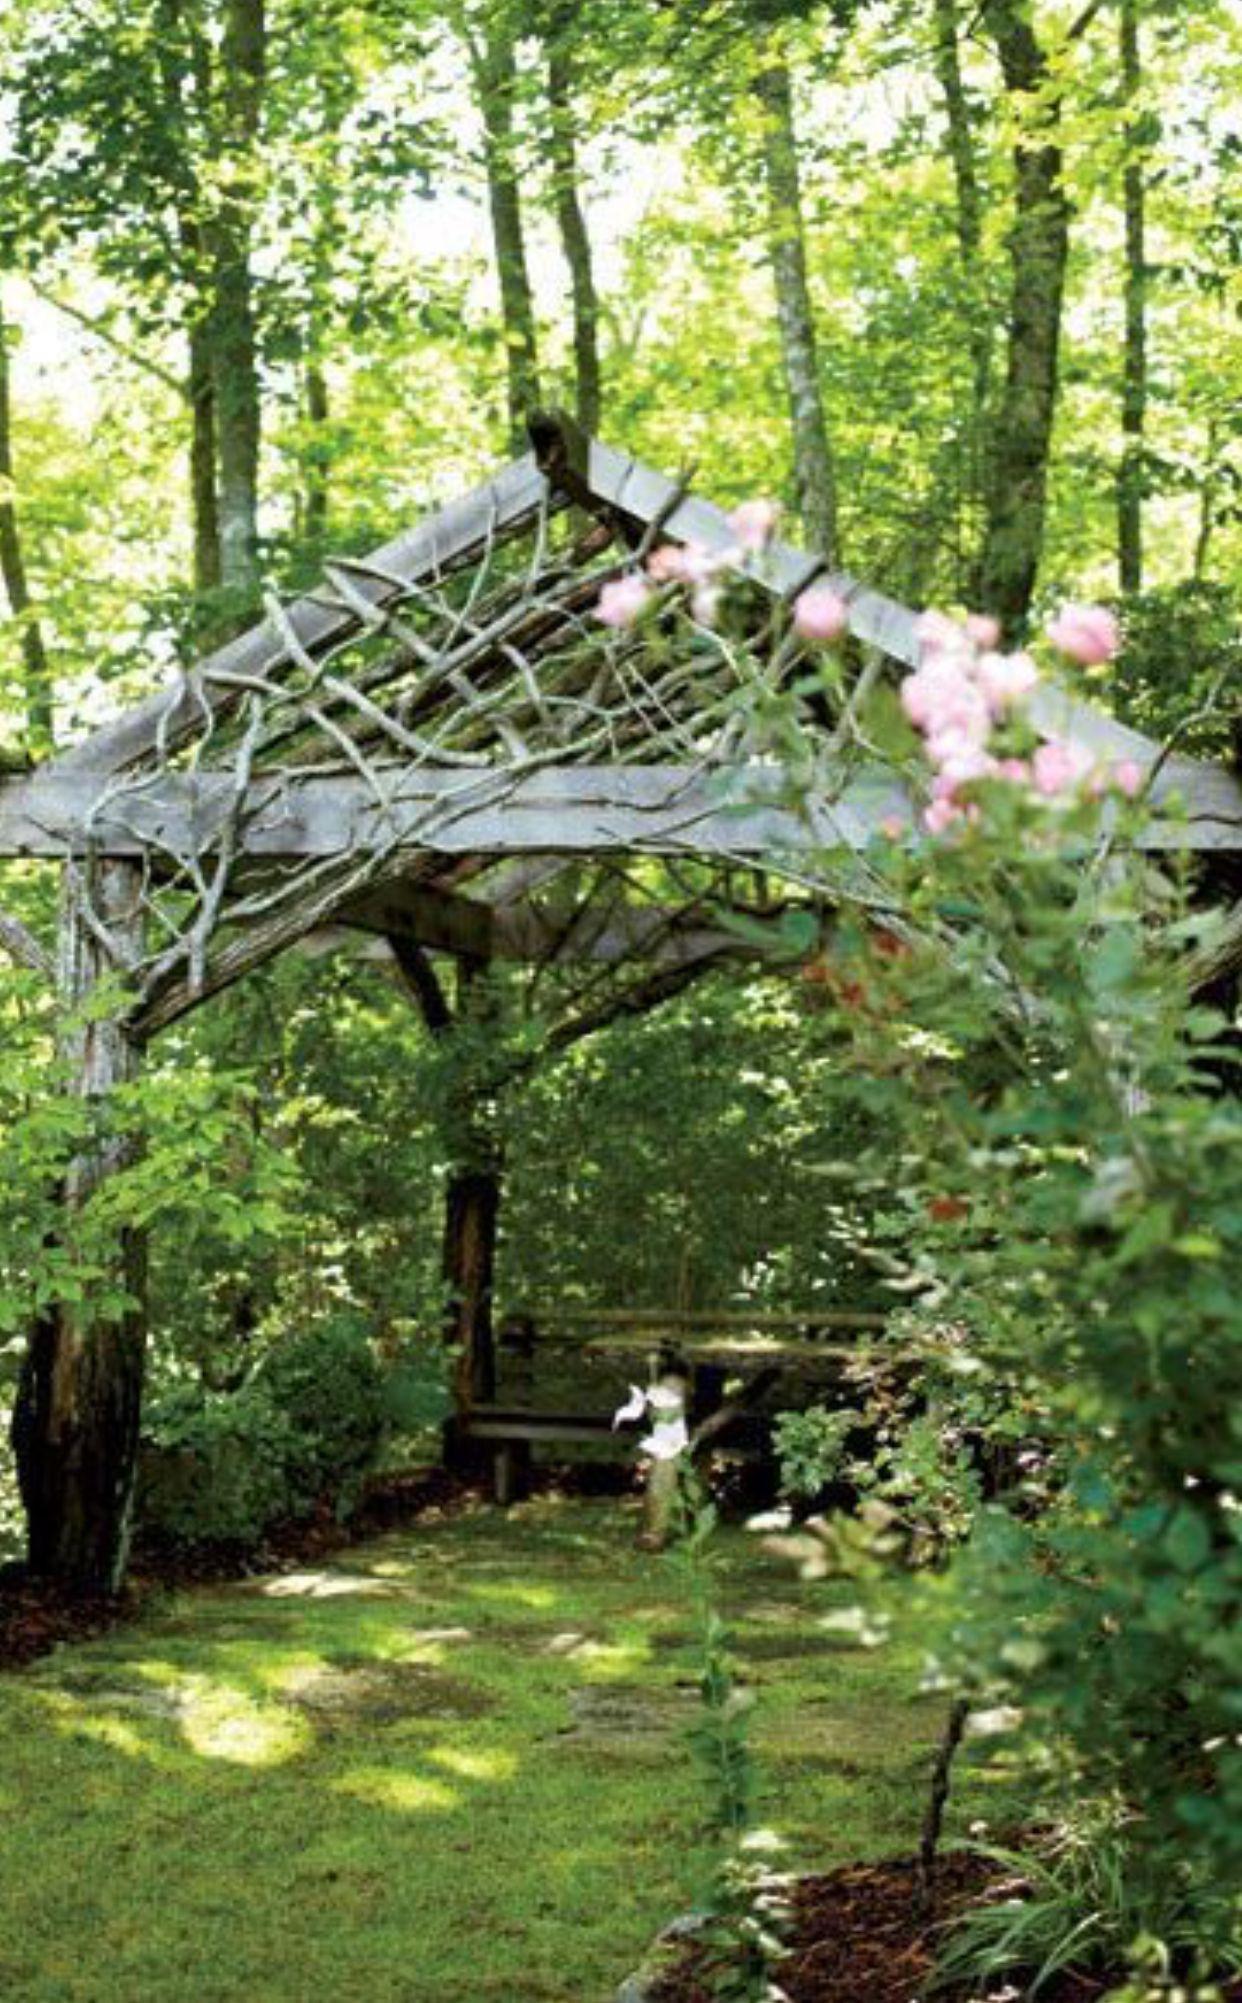 pin by bess collins on garden ideas | pinterest | gardens, pergolas